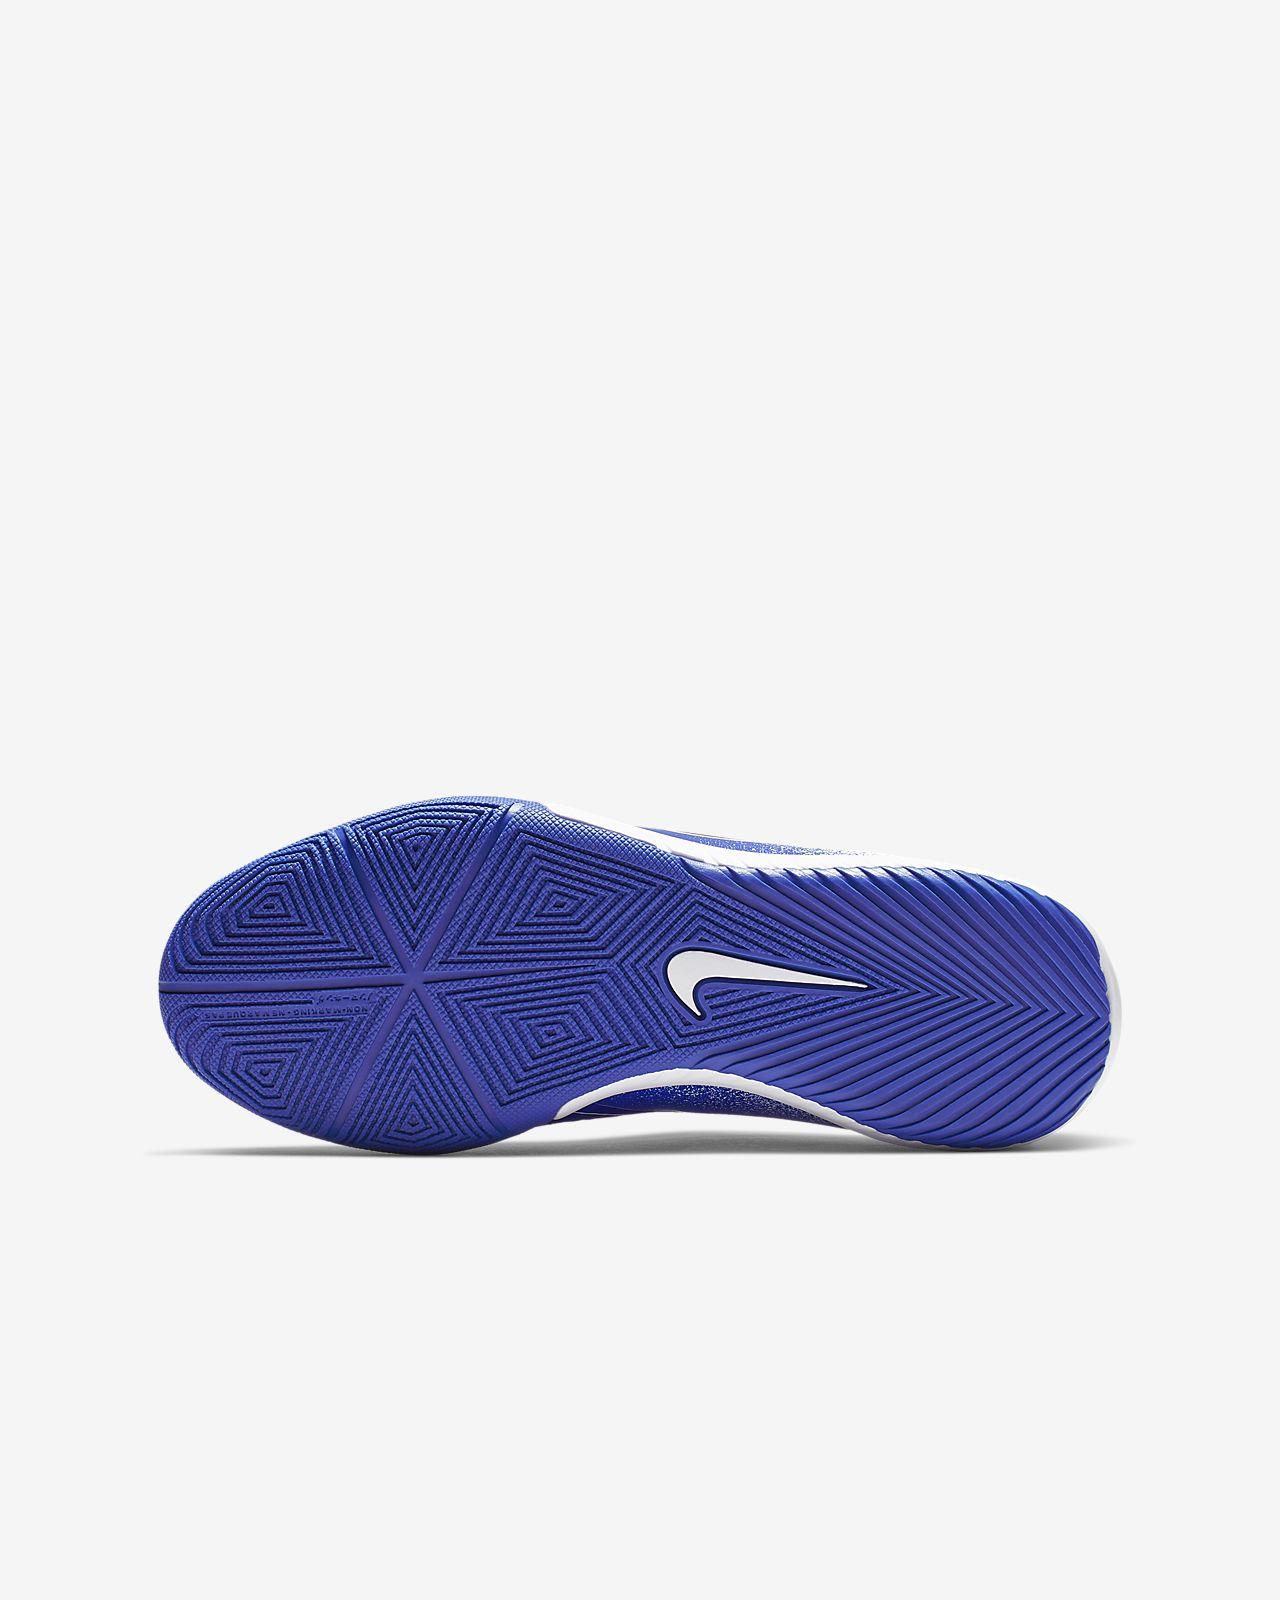 size 40 390f2 efd48 ... Nike Jr. Phantom Venom Academy IC Older Kids  Indoor Court Football Boot